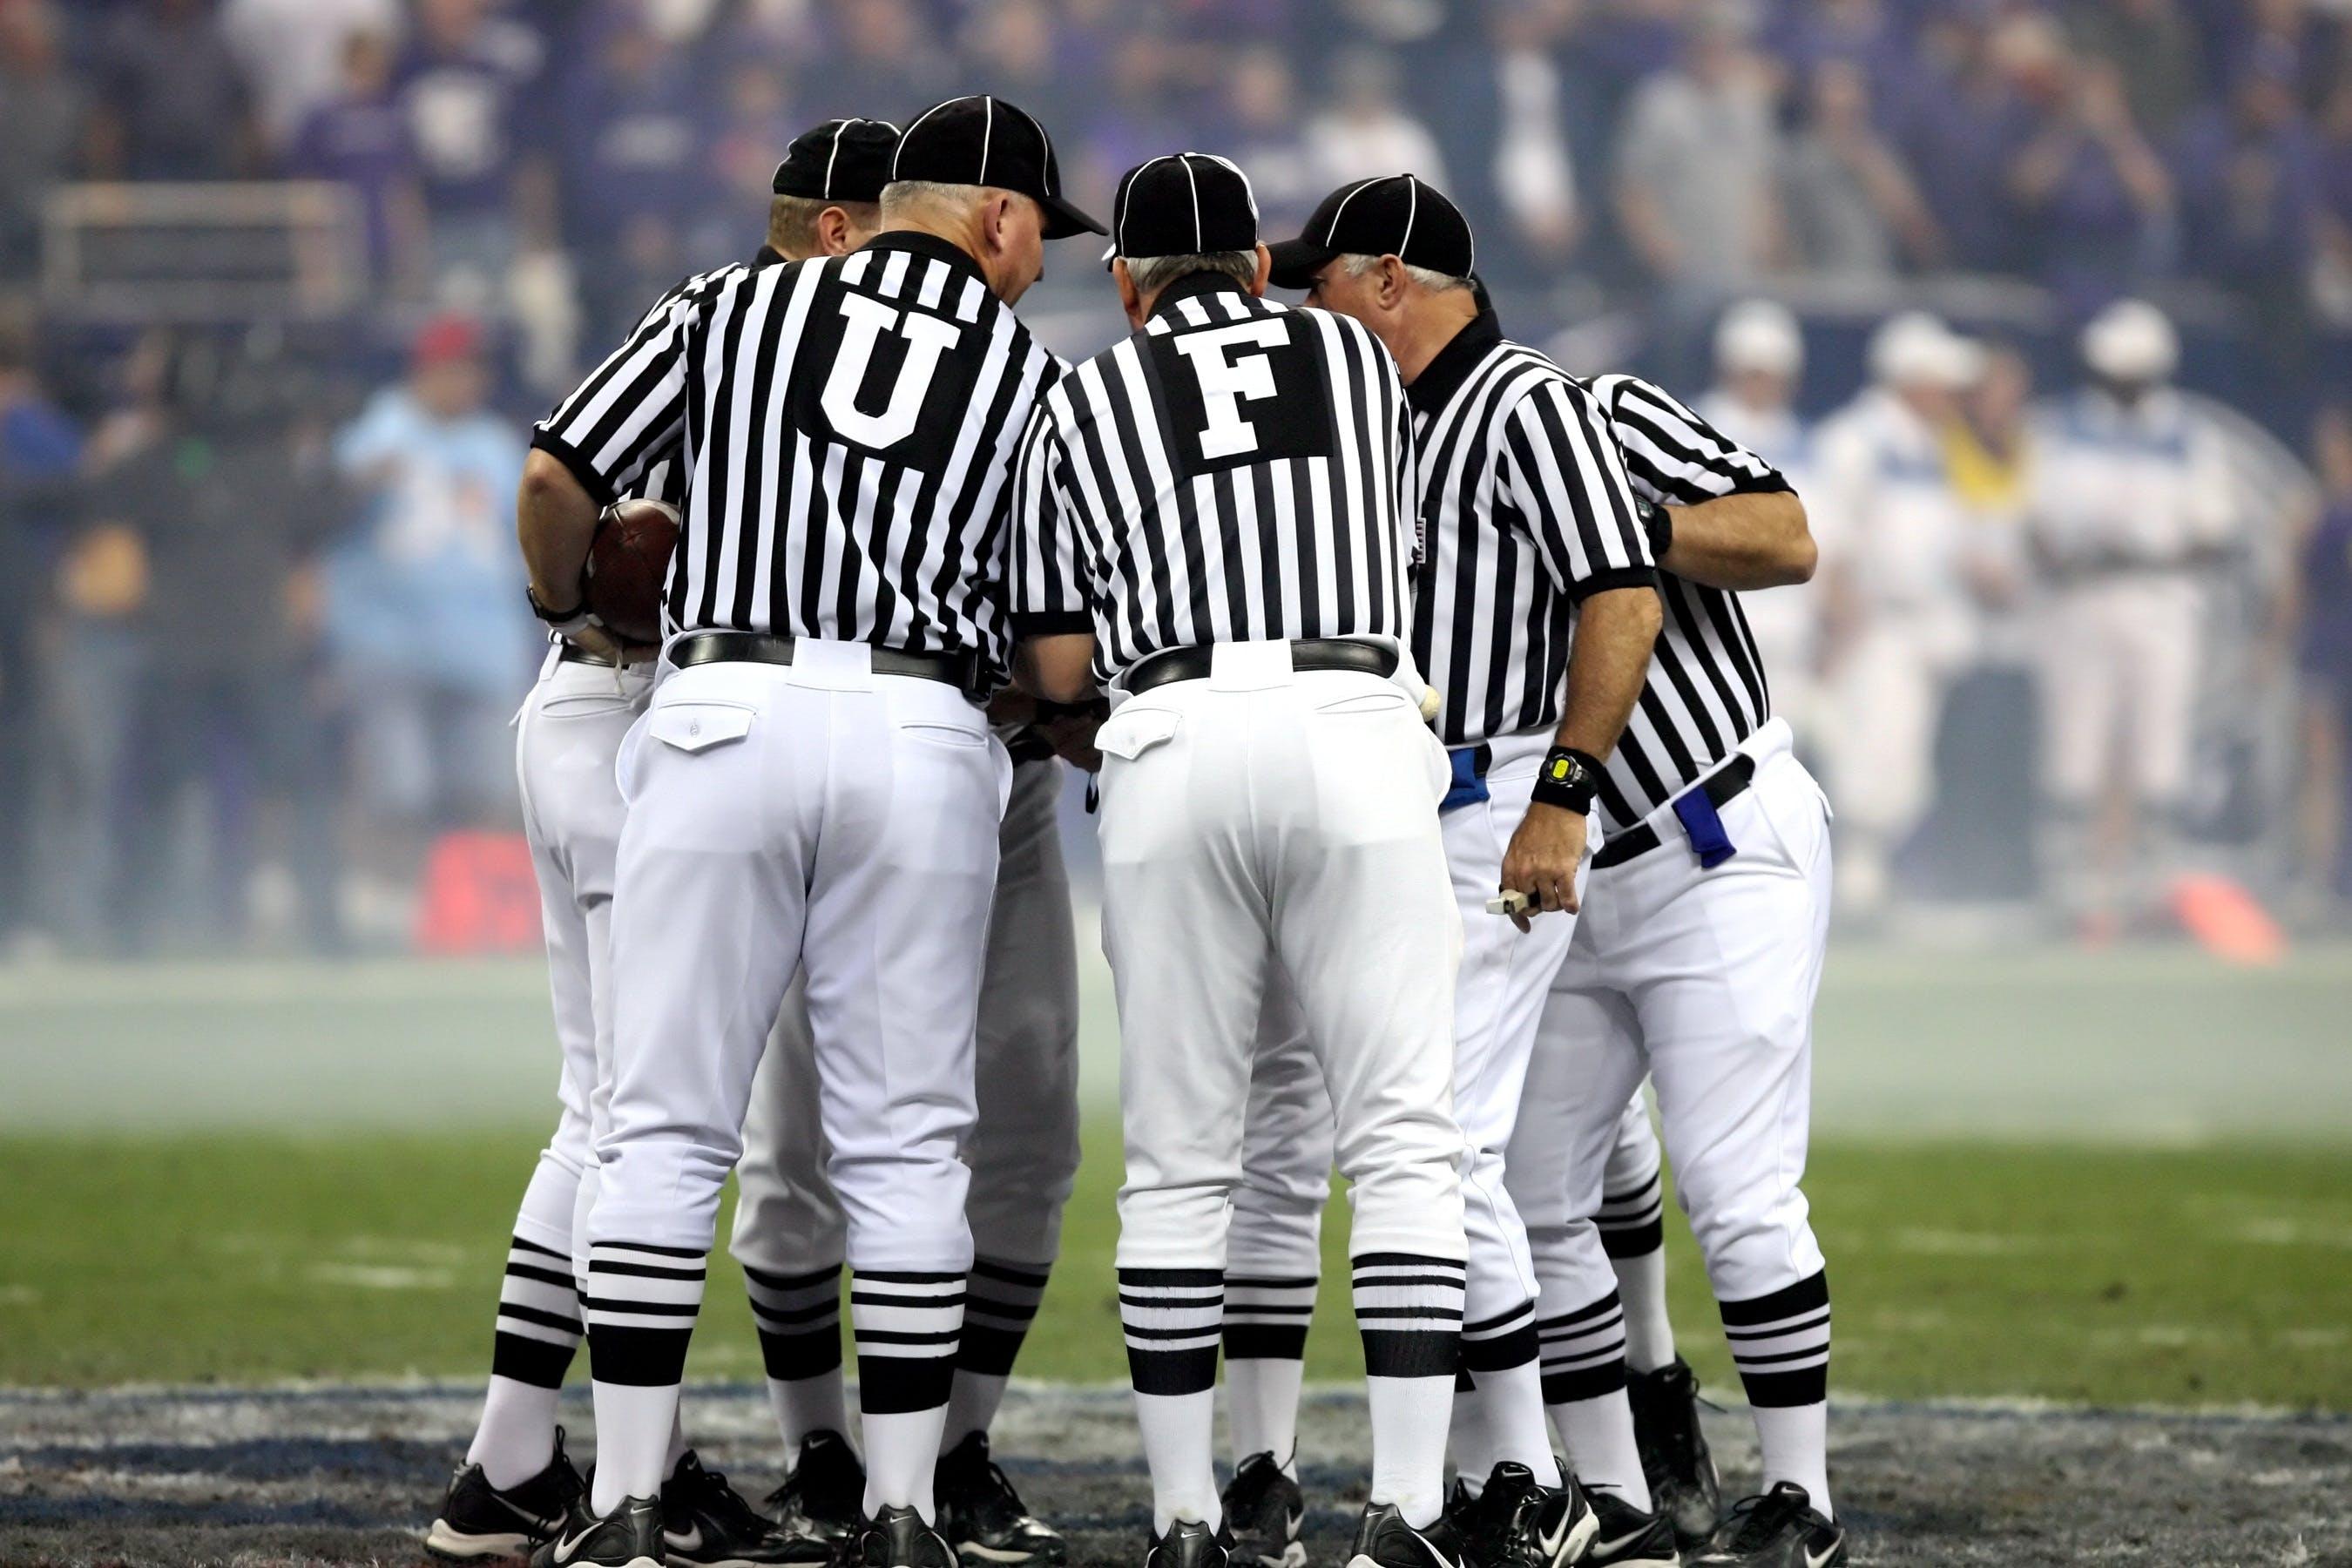 Peoples Wearing Black and White Stripe Baseball Jersey Shirt on Baseball Field